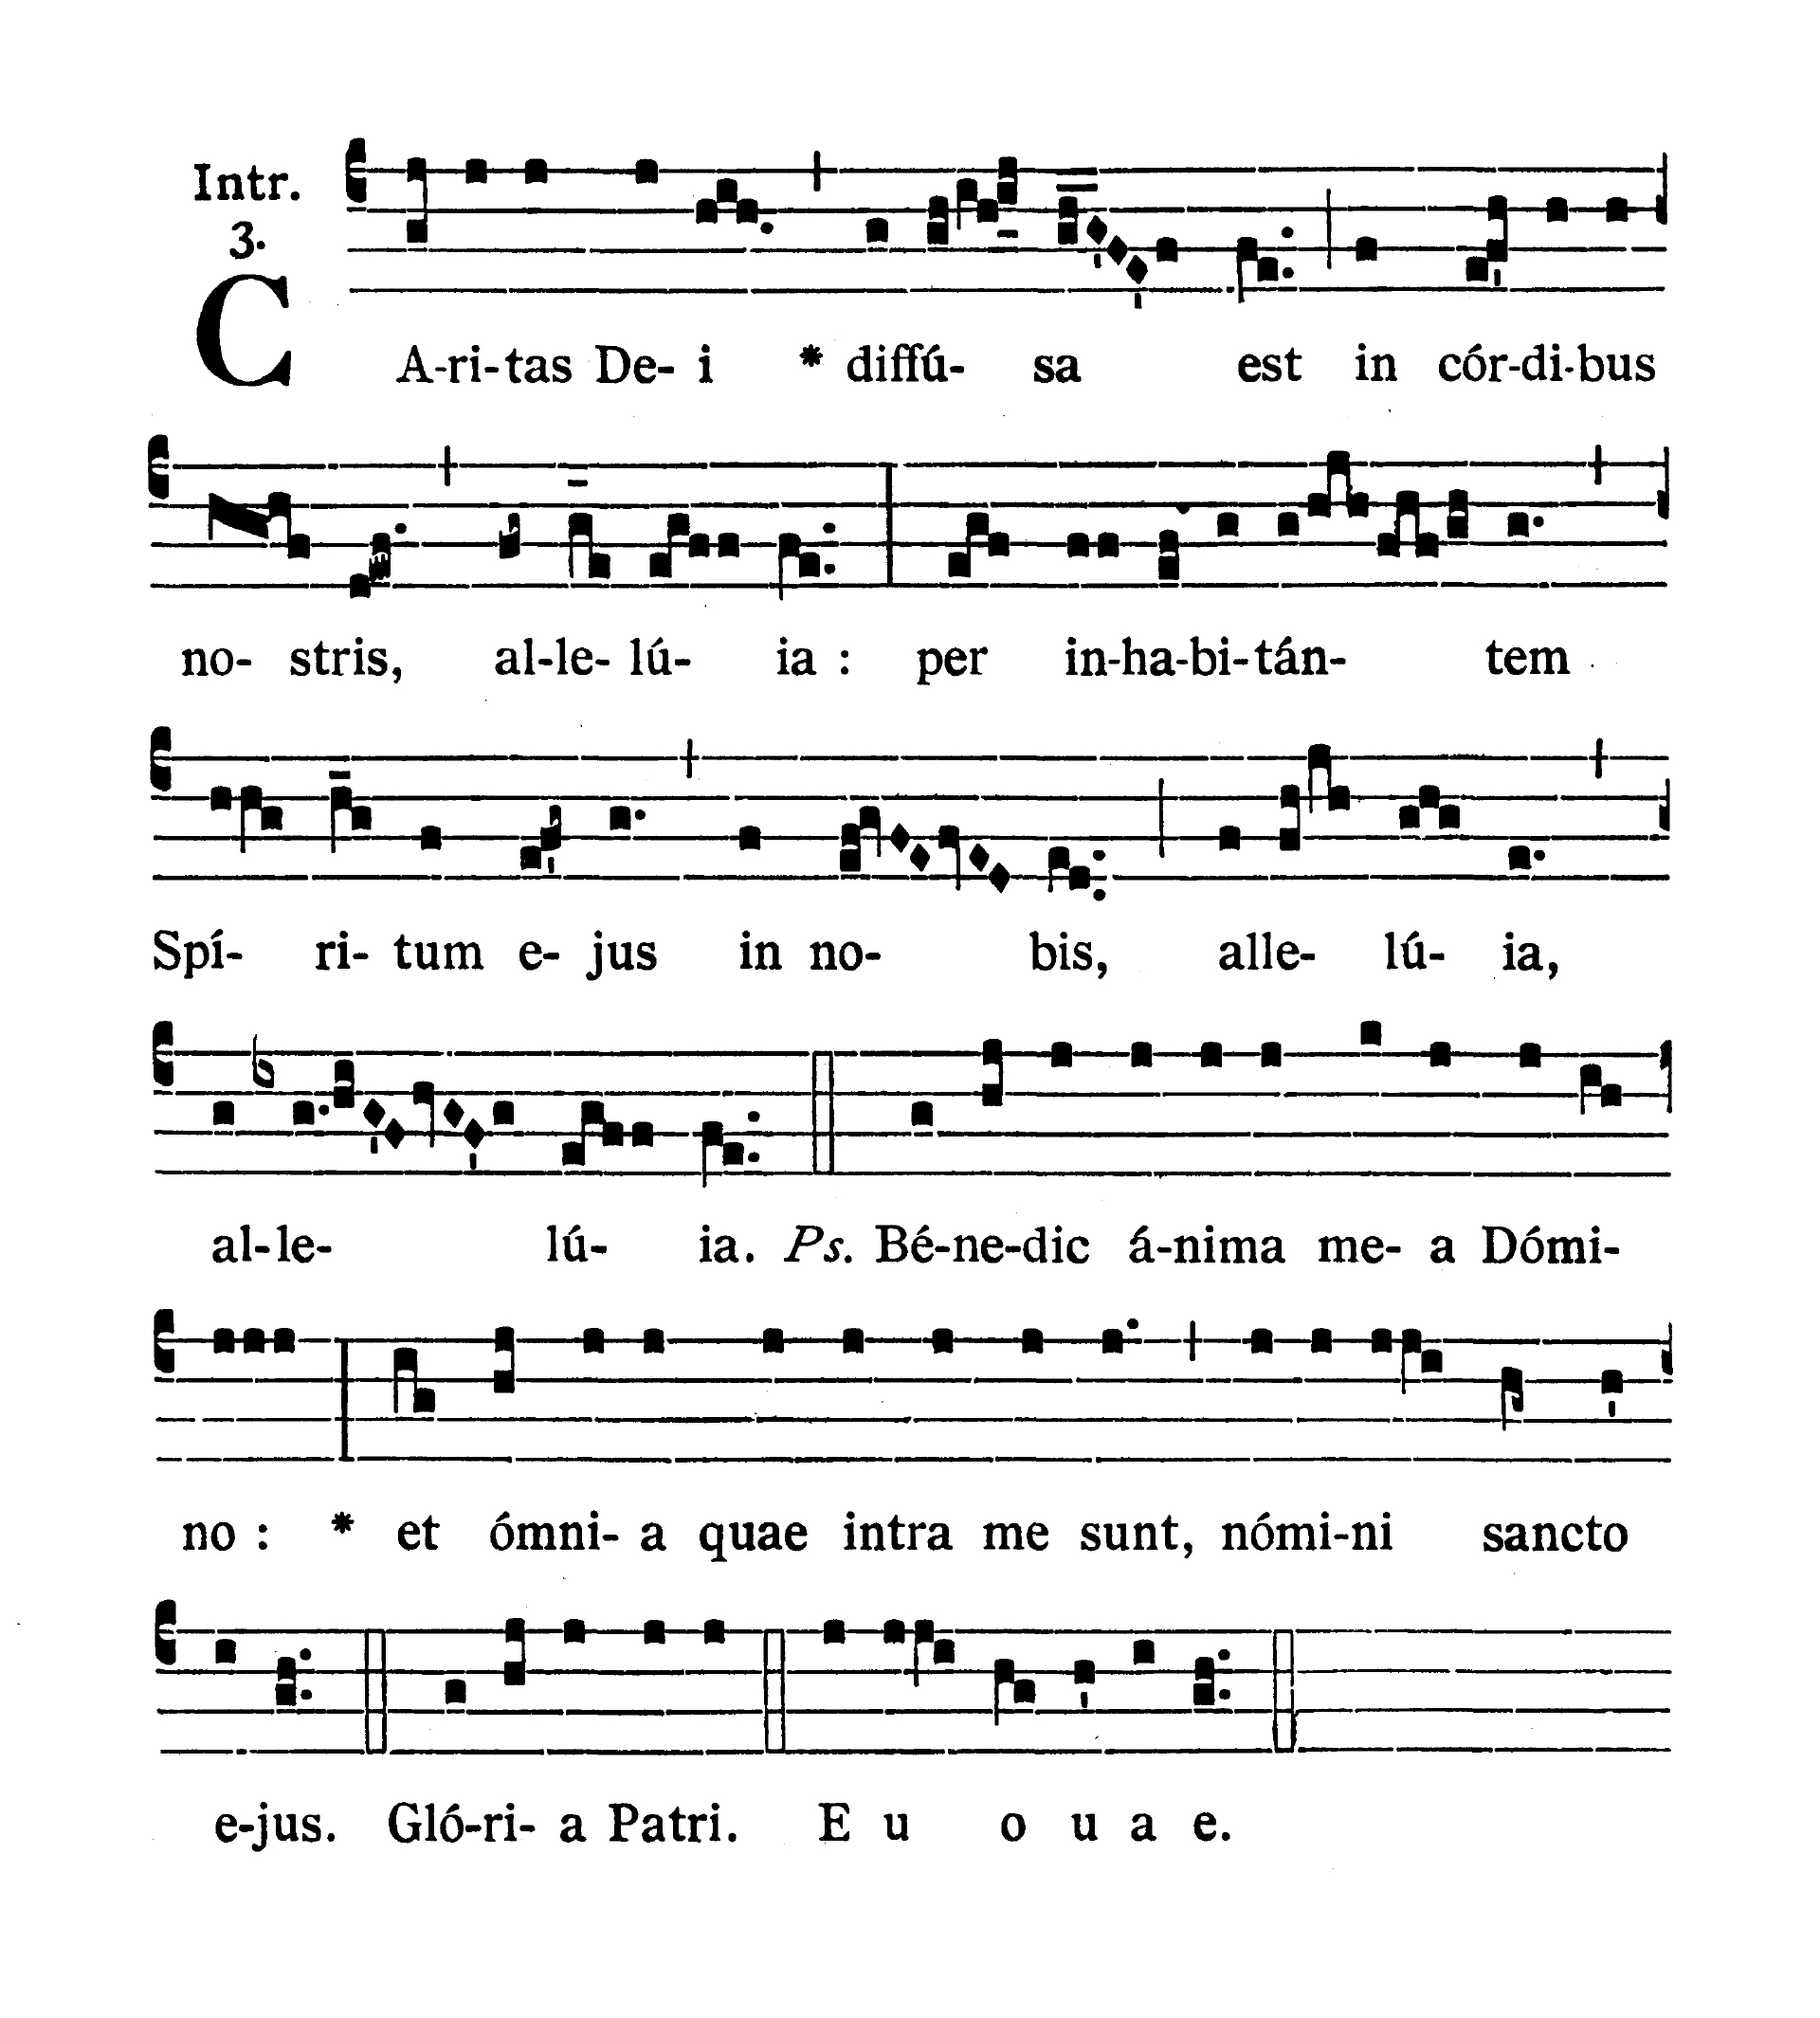 Sabbato infra Octavam Pentecostes (Sobota w oktawie Zesłania Ducha Świętego) - Introitus (Caritas Dei)